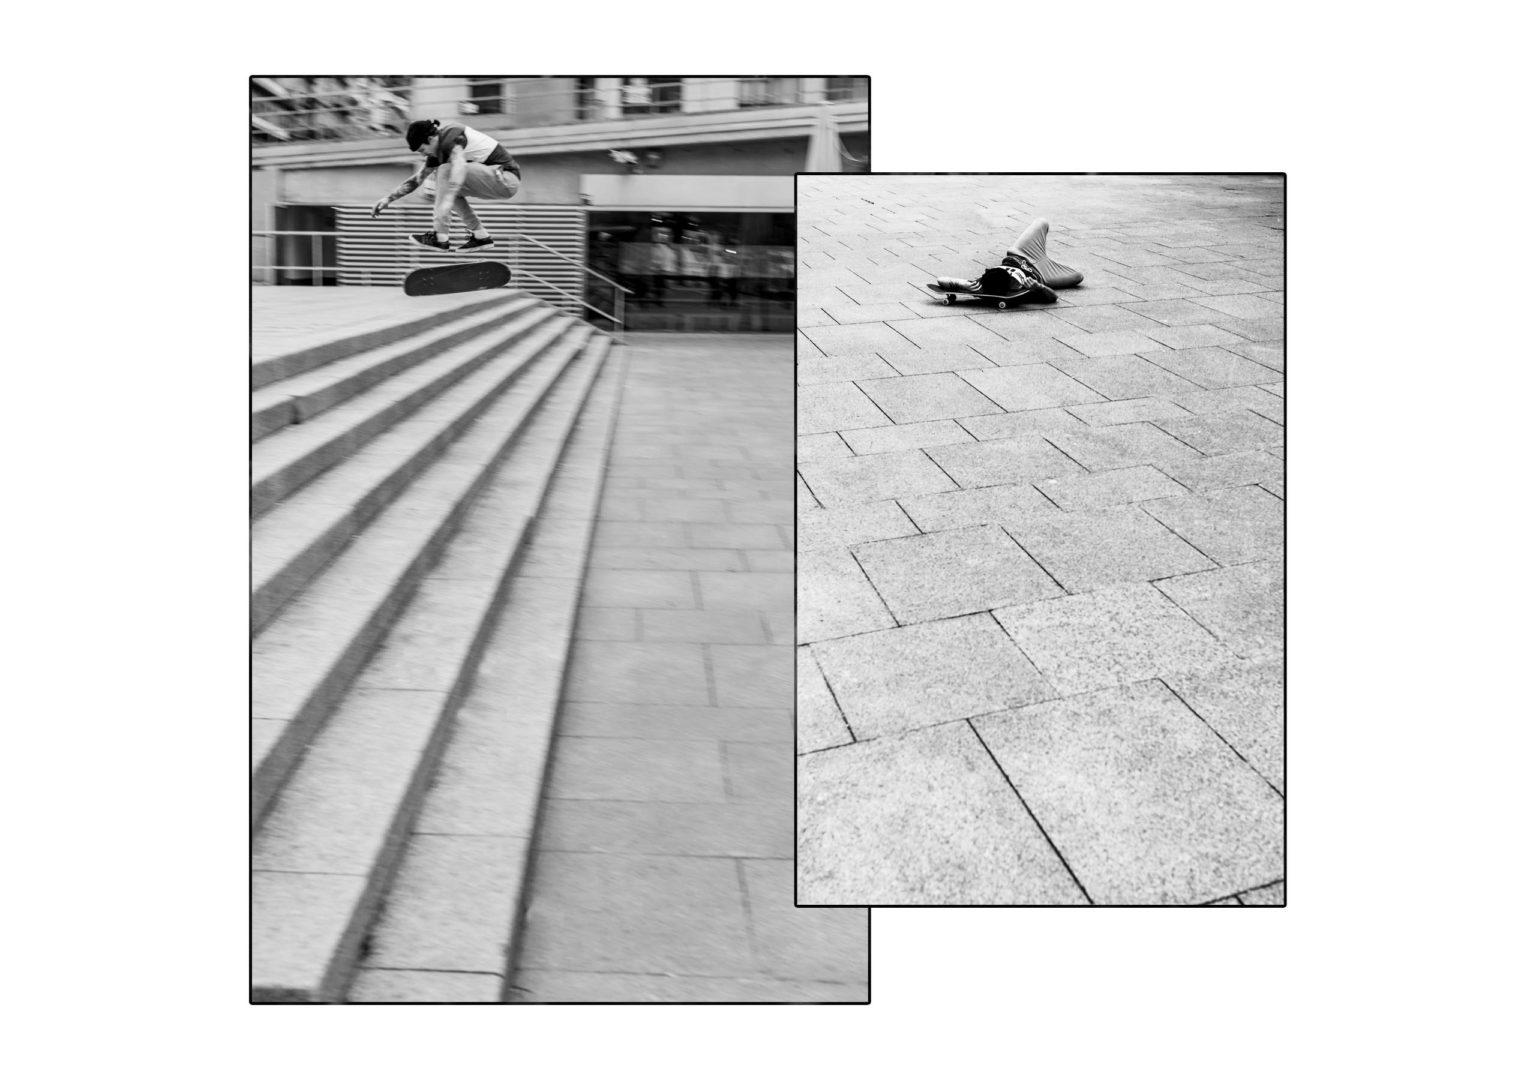 skateboarding_peibol_ aaron sio